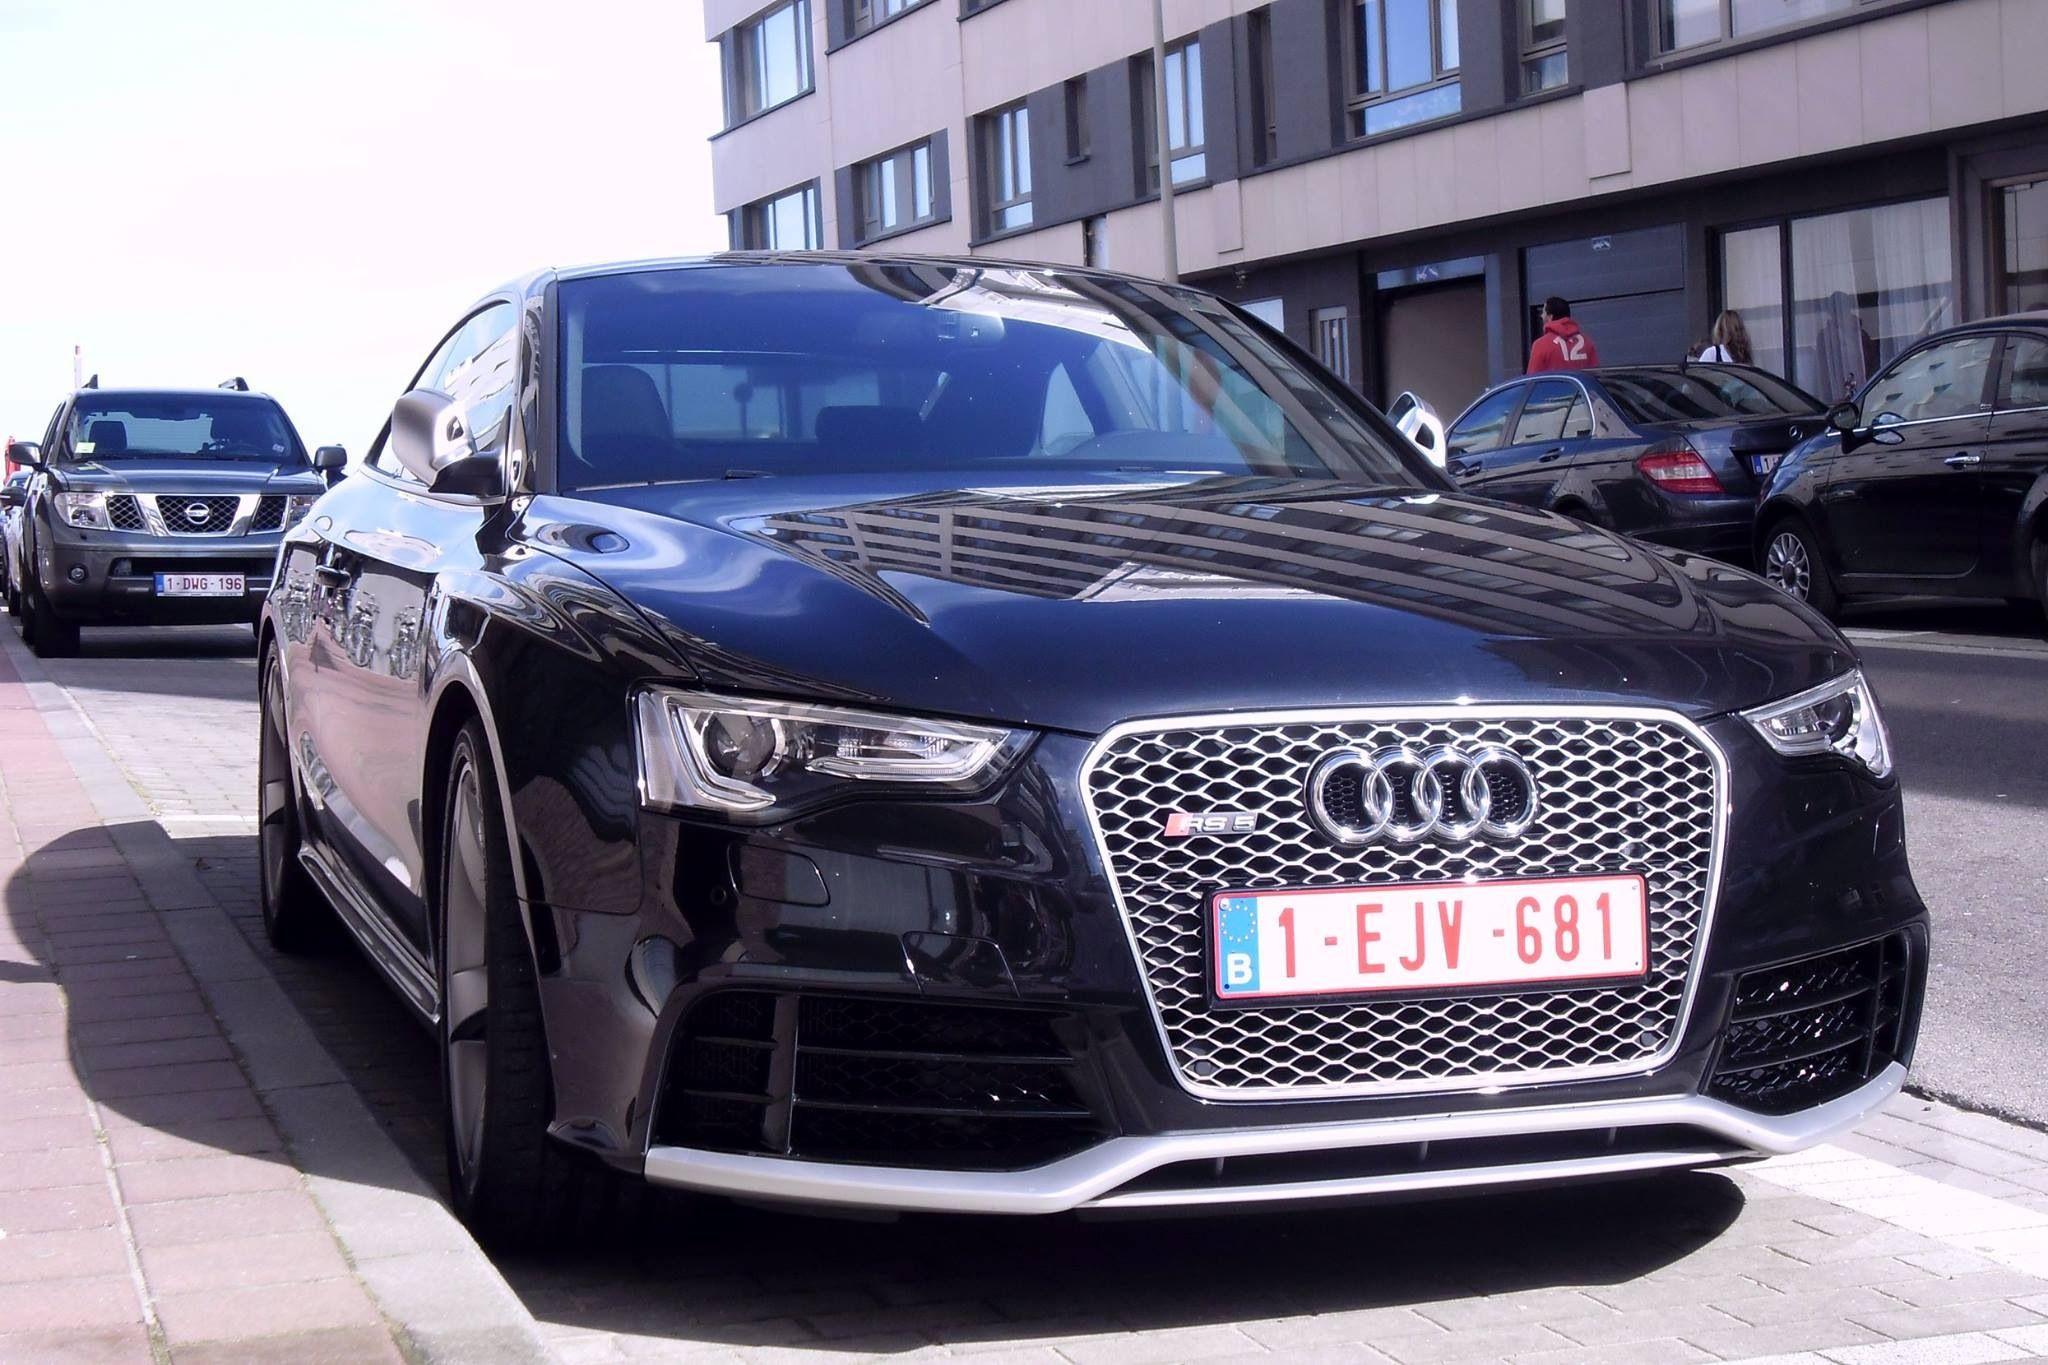 Audi RS5 Knokke Belgium Spotted cars Pinterest